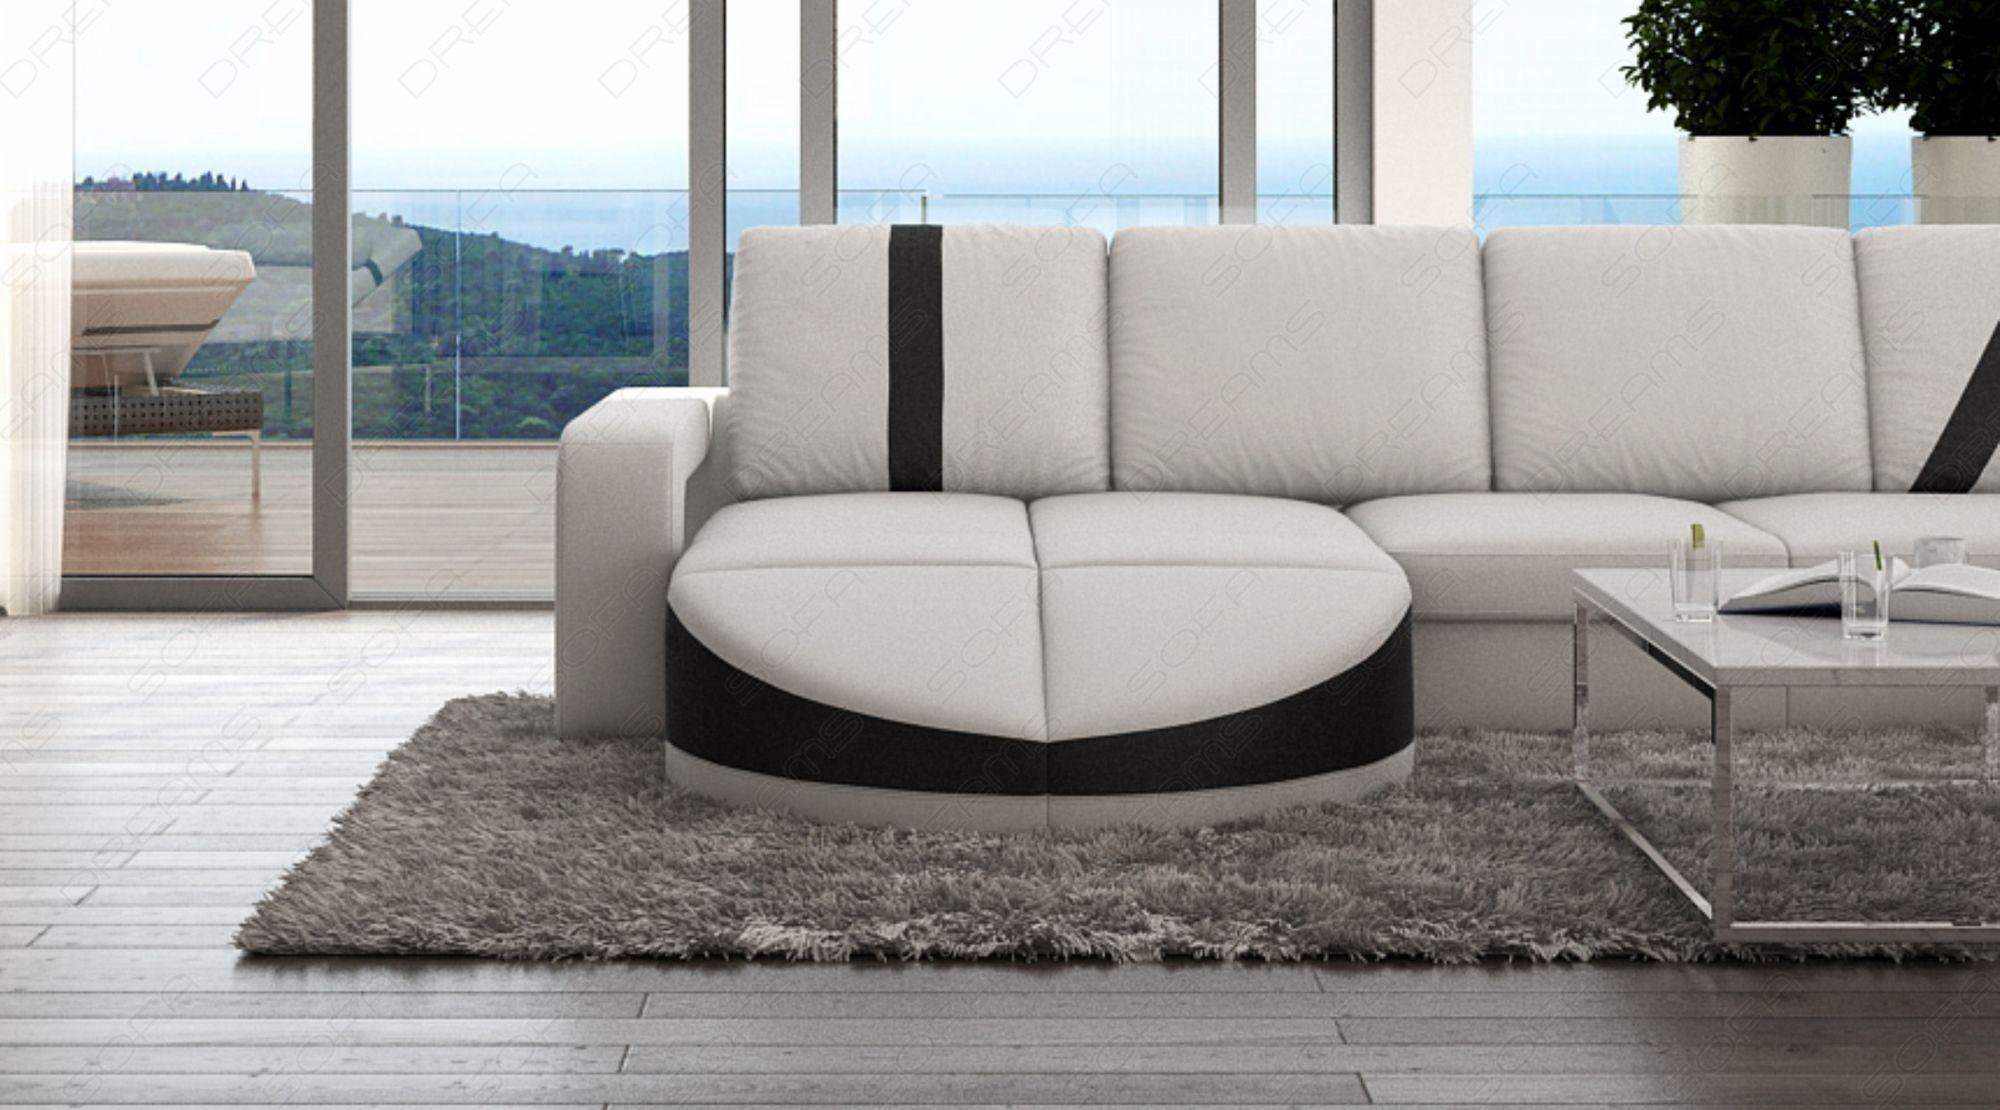 Mega Wohnlandschaft Florenz in U Form - Sofa in Leder und ...